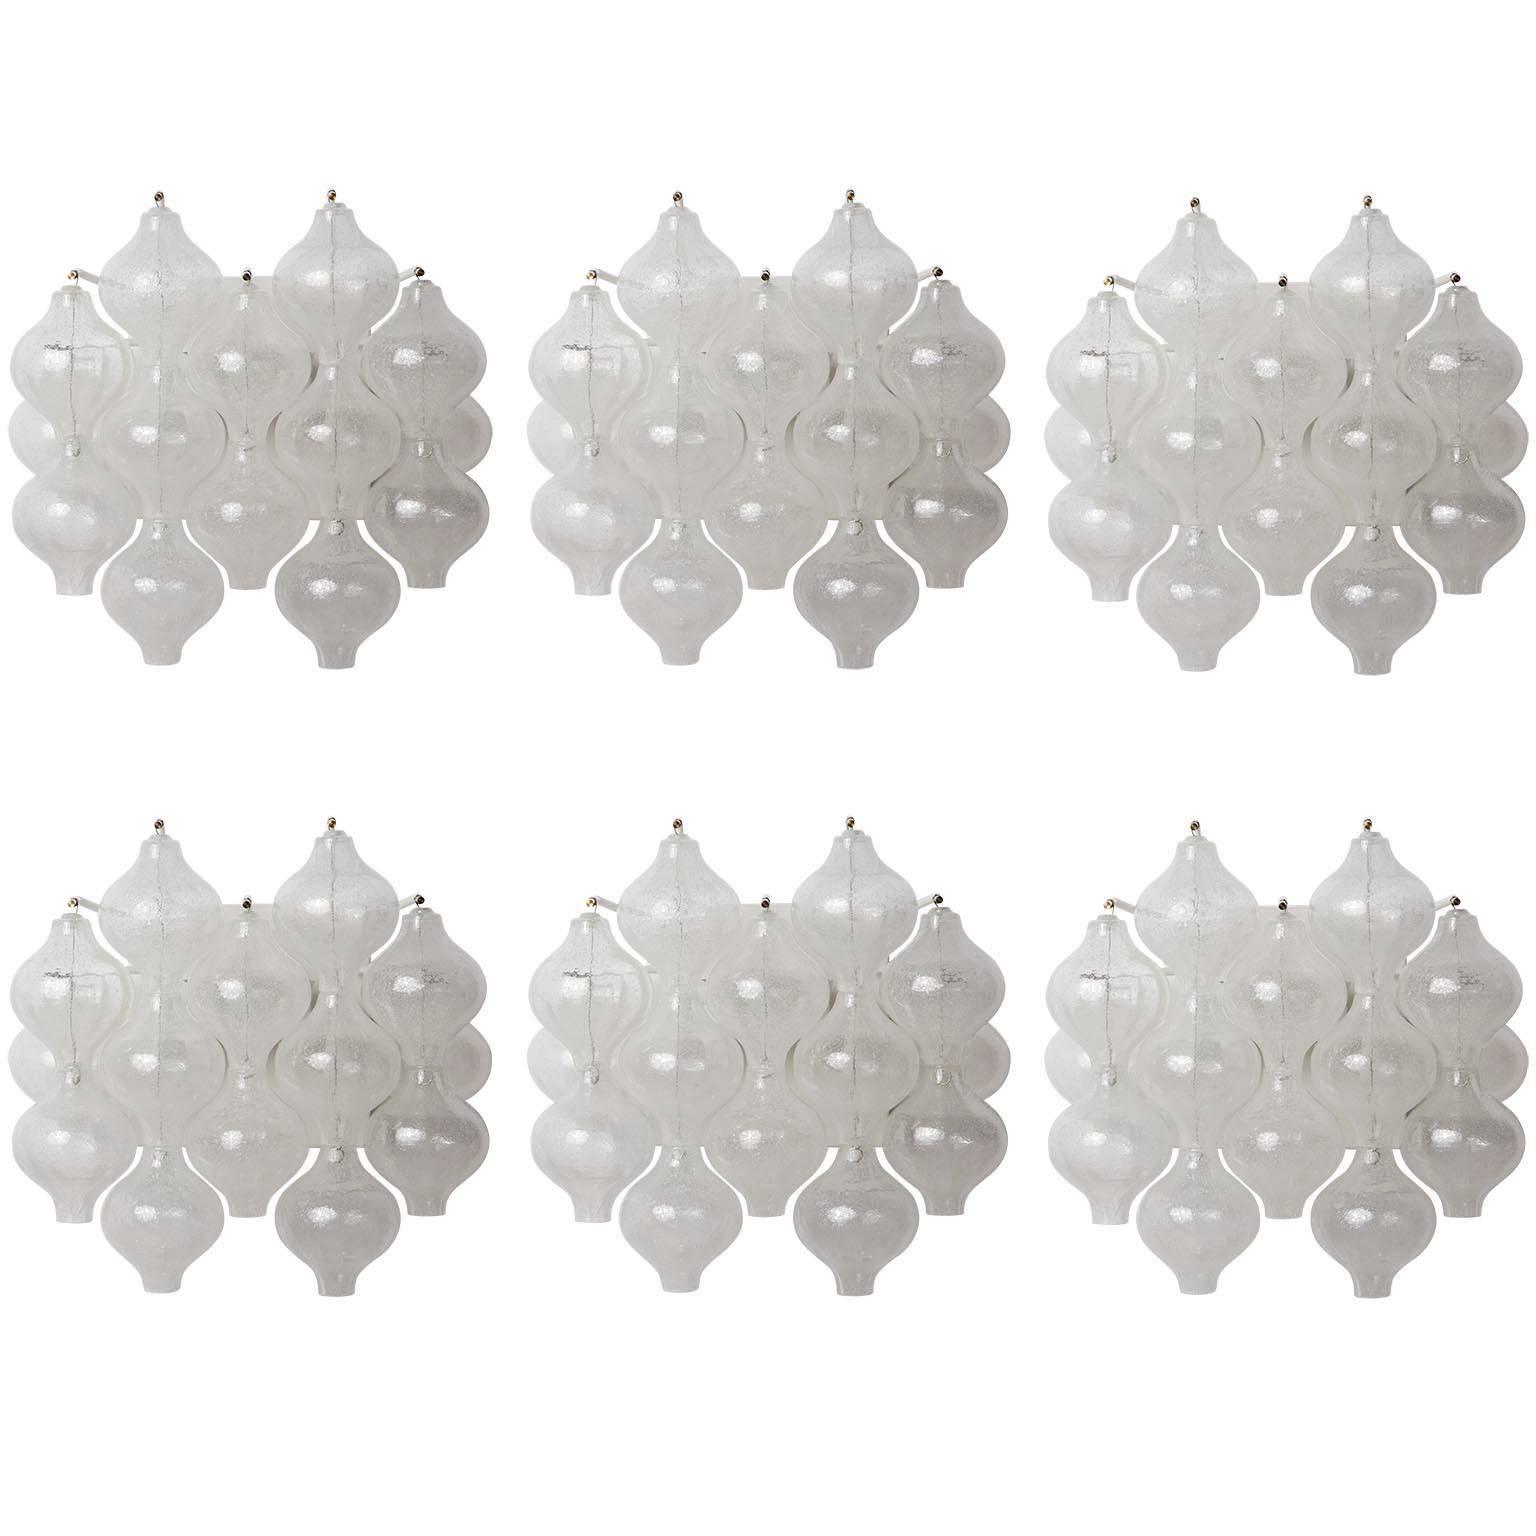 Six Kalmar 'Tulipan' Wall Lights Sconces, Glass Brass, 1970s